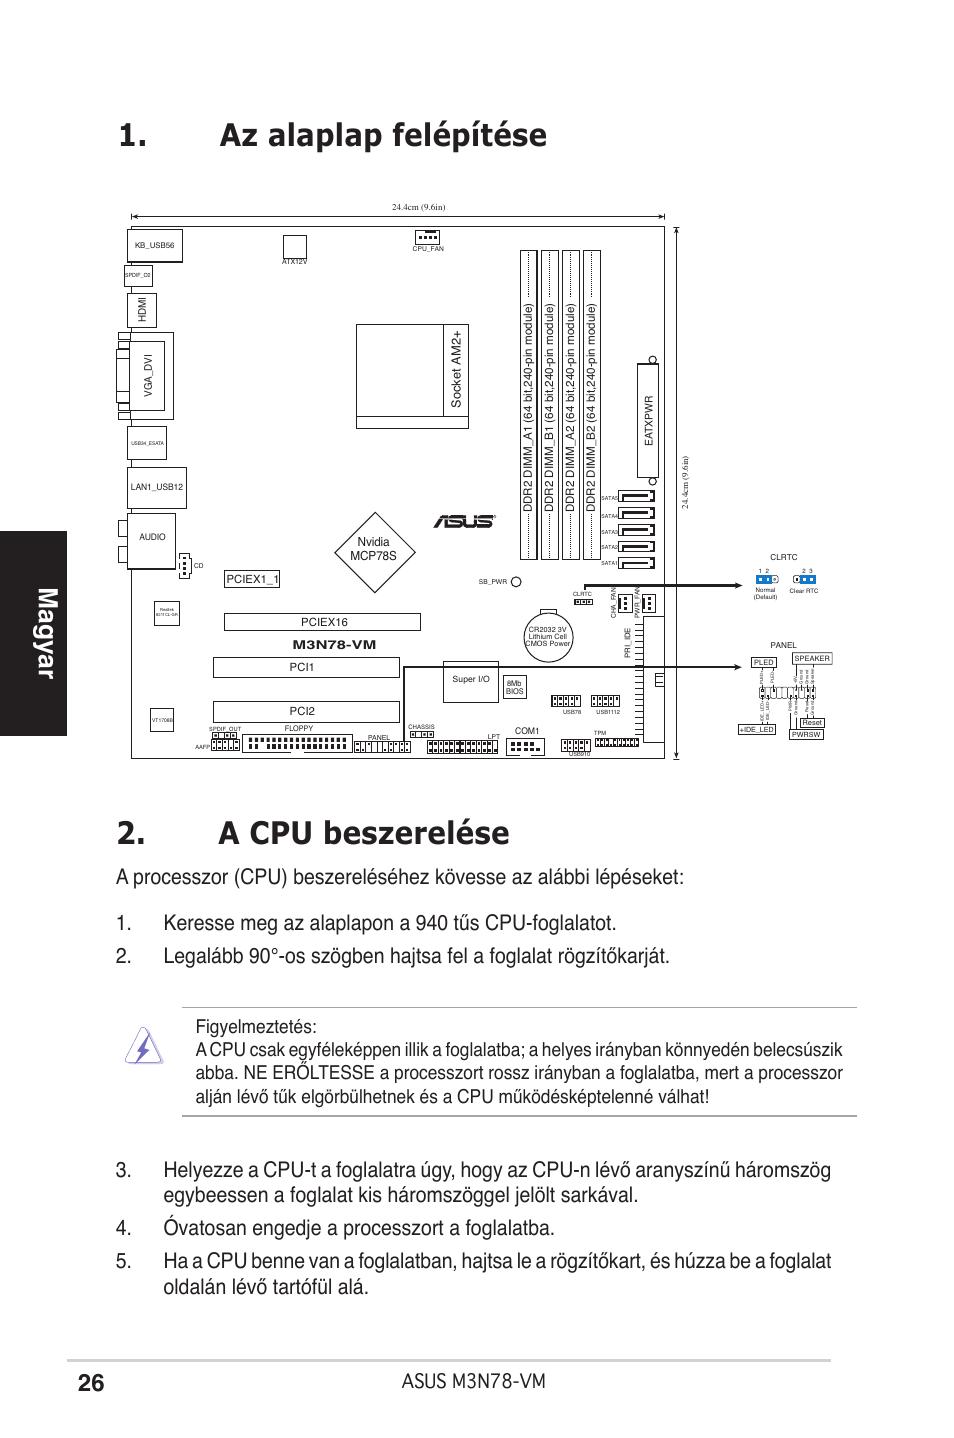 asus m3n78 vm page26 a cpu beszerel�se, az alaplap fel�p�t�se, magyar asus m3n78 vm VMware View Diagram at aneh.co